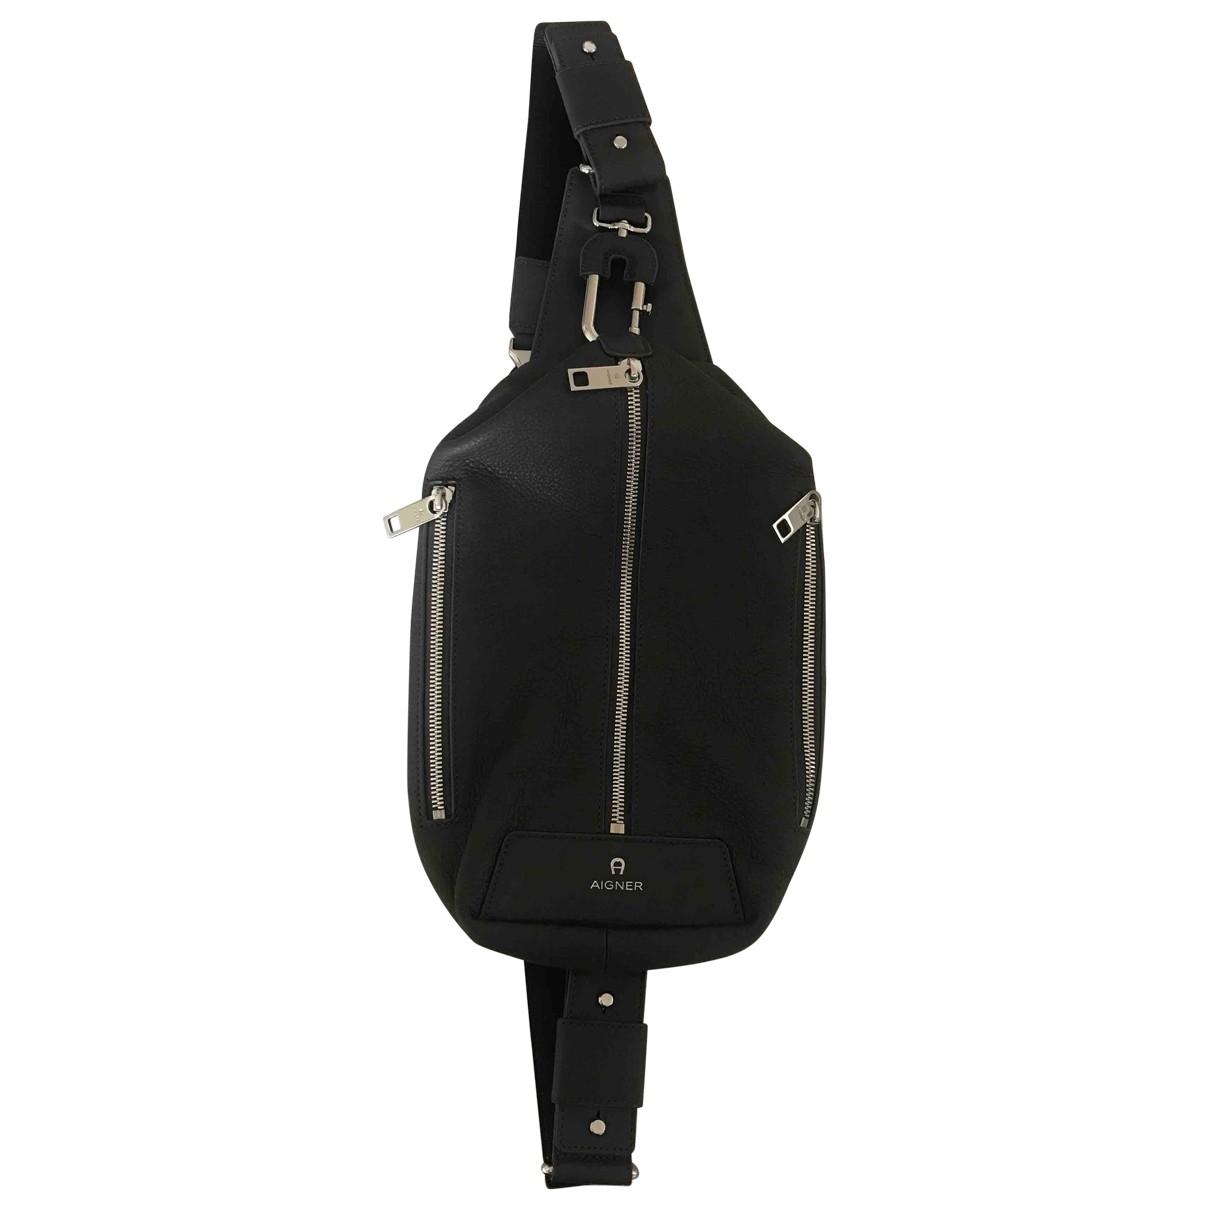 Aigner \N Anthracite Leather bag for Men \N